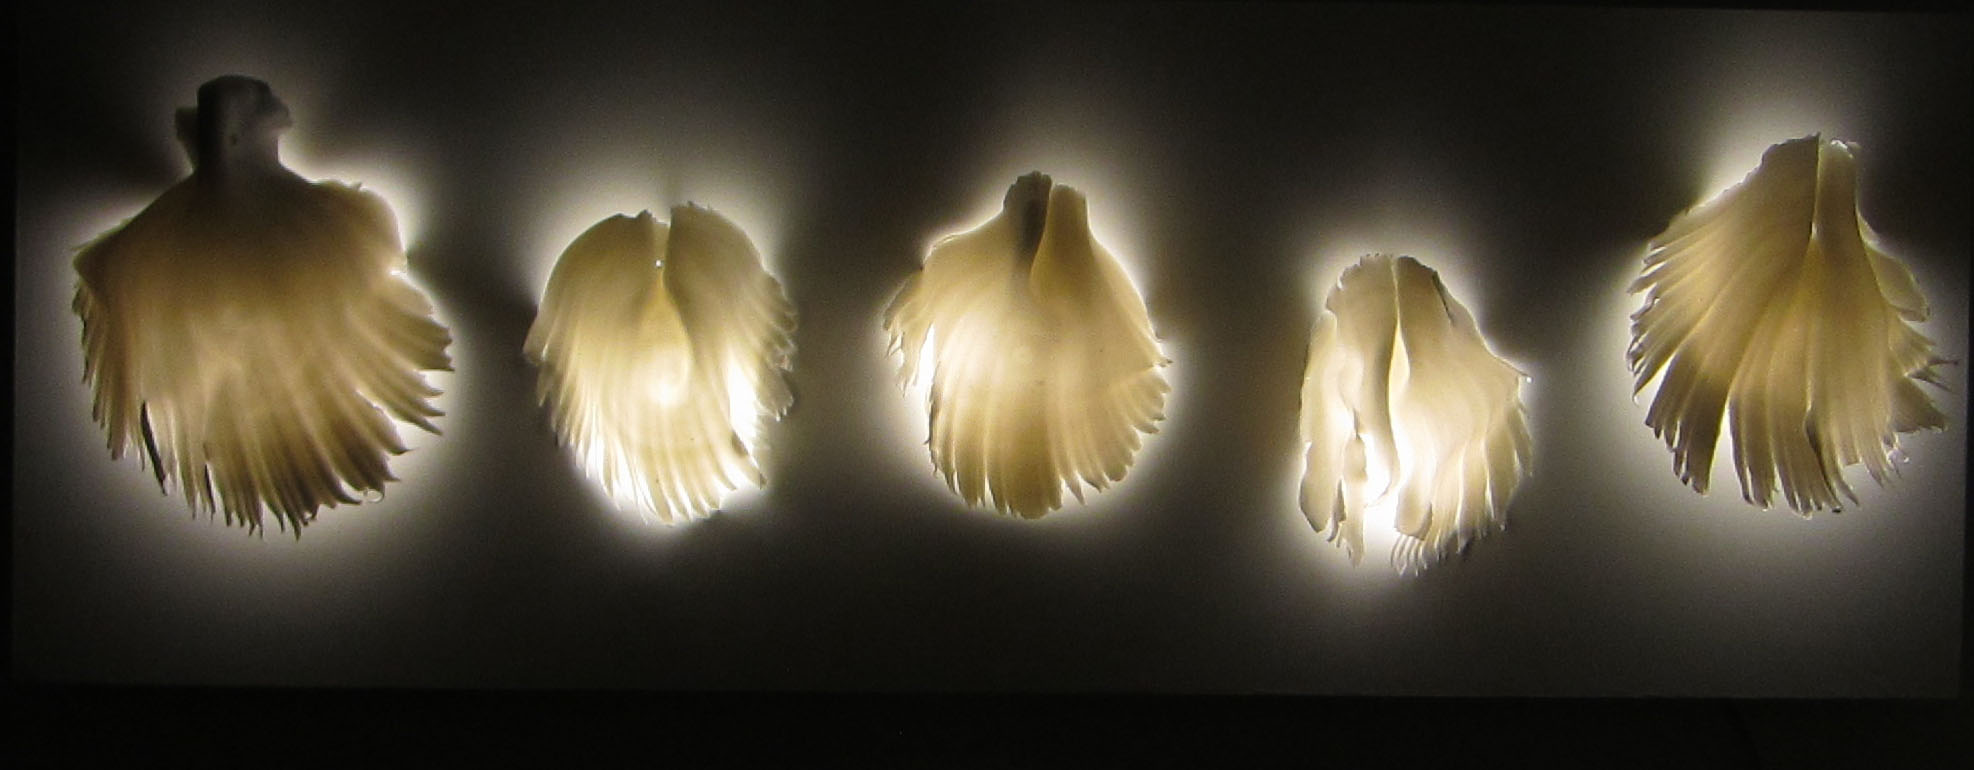 4. Angel wings installation.